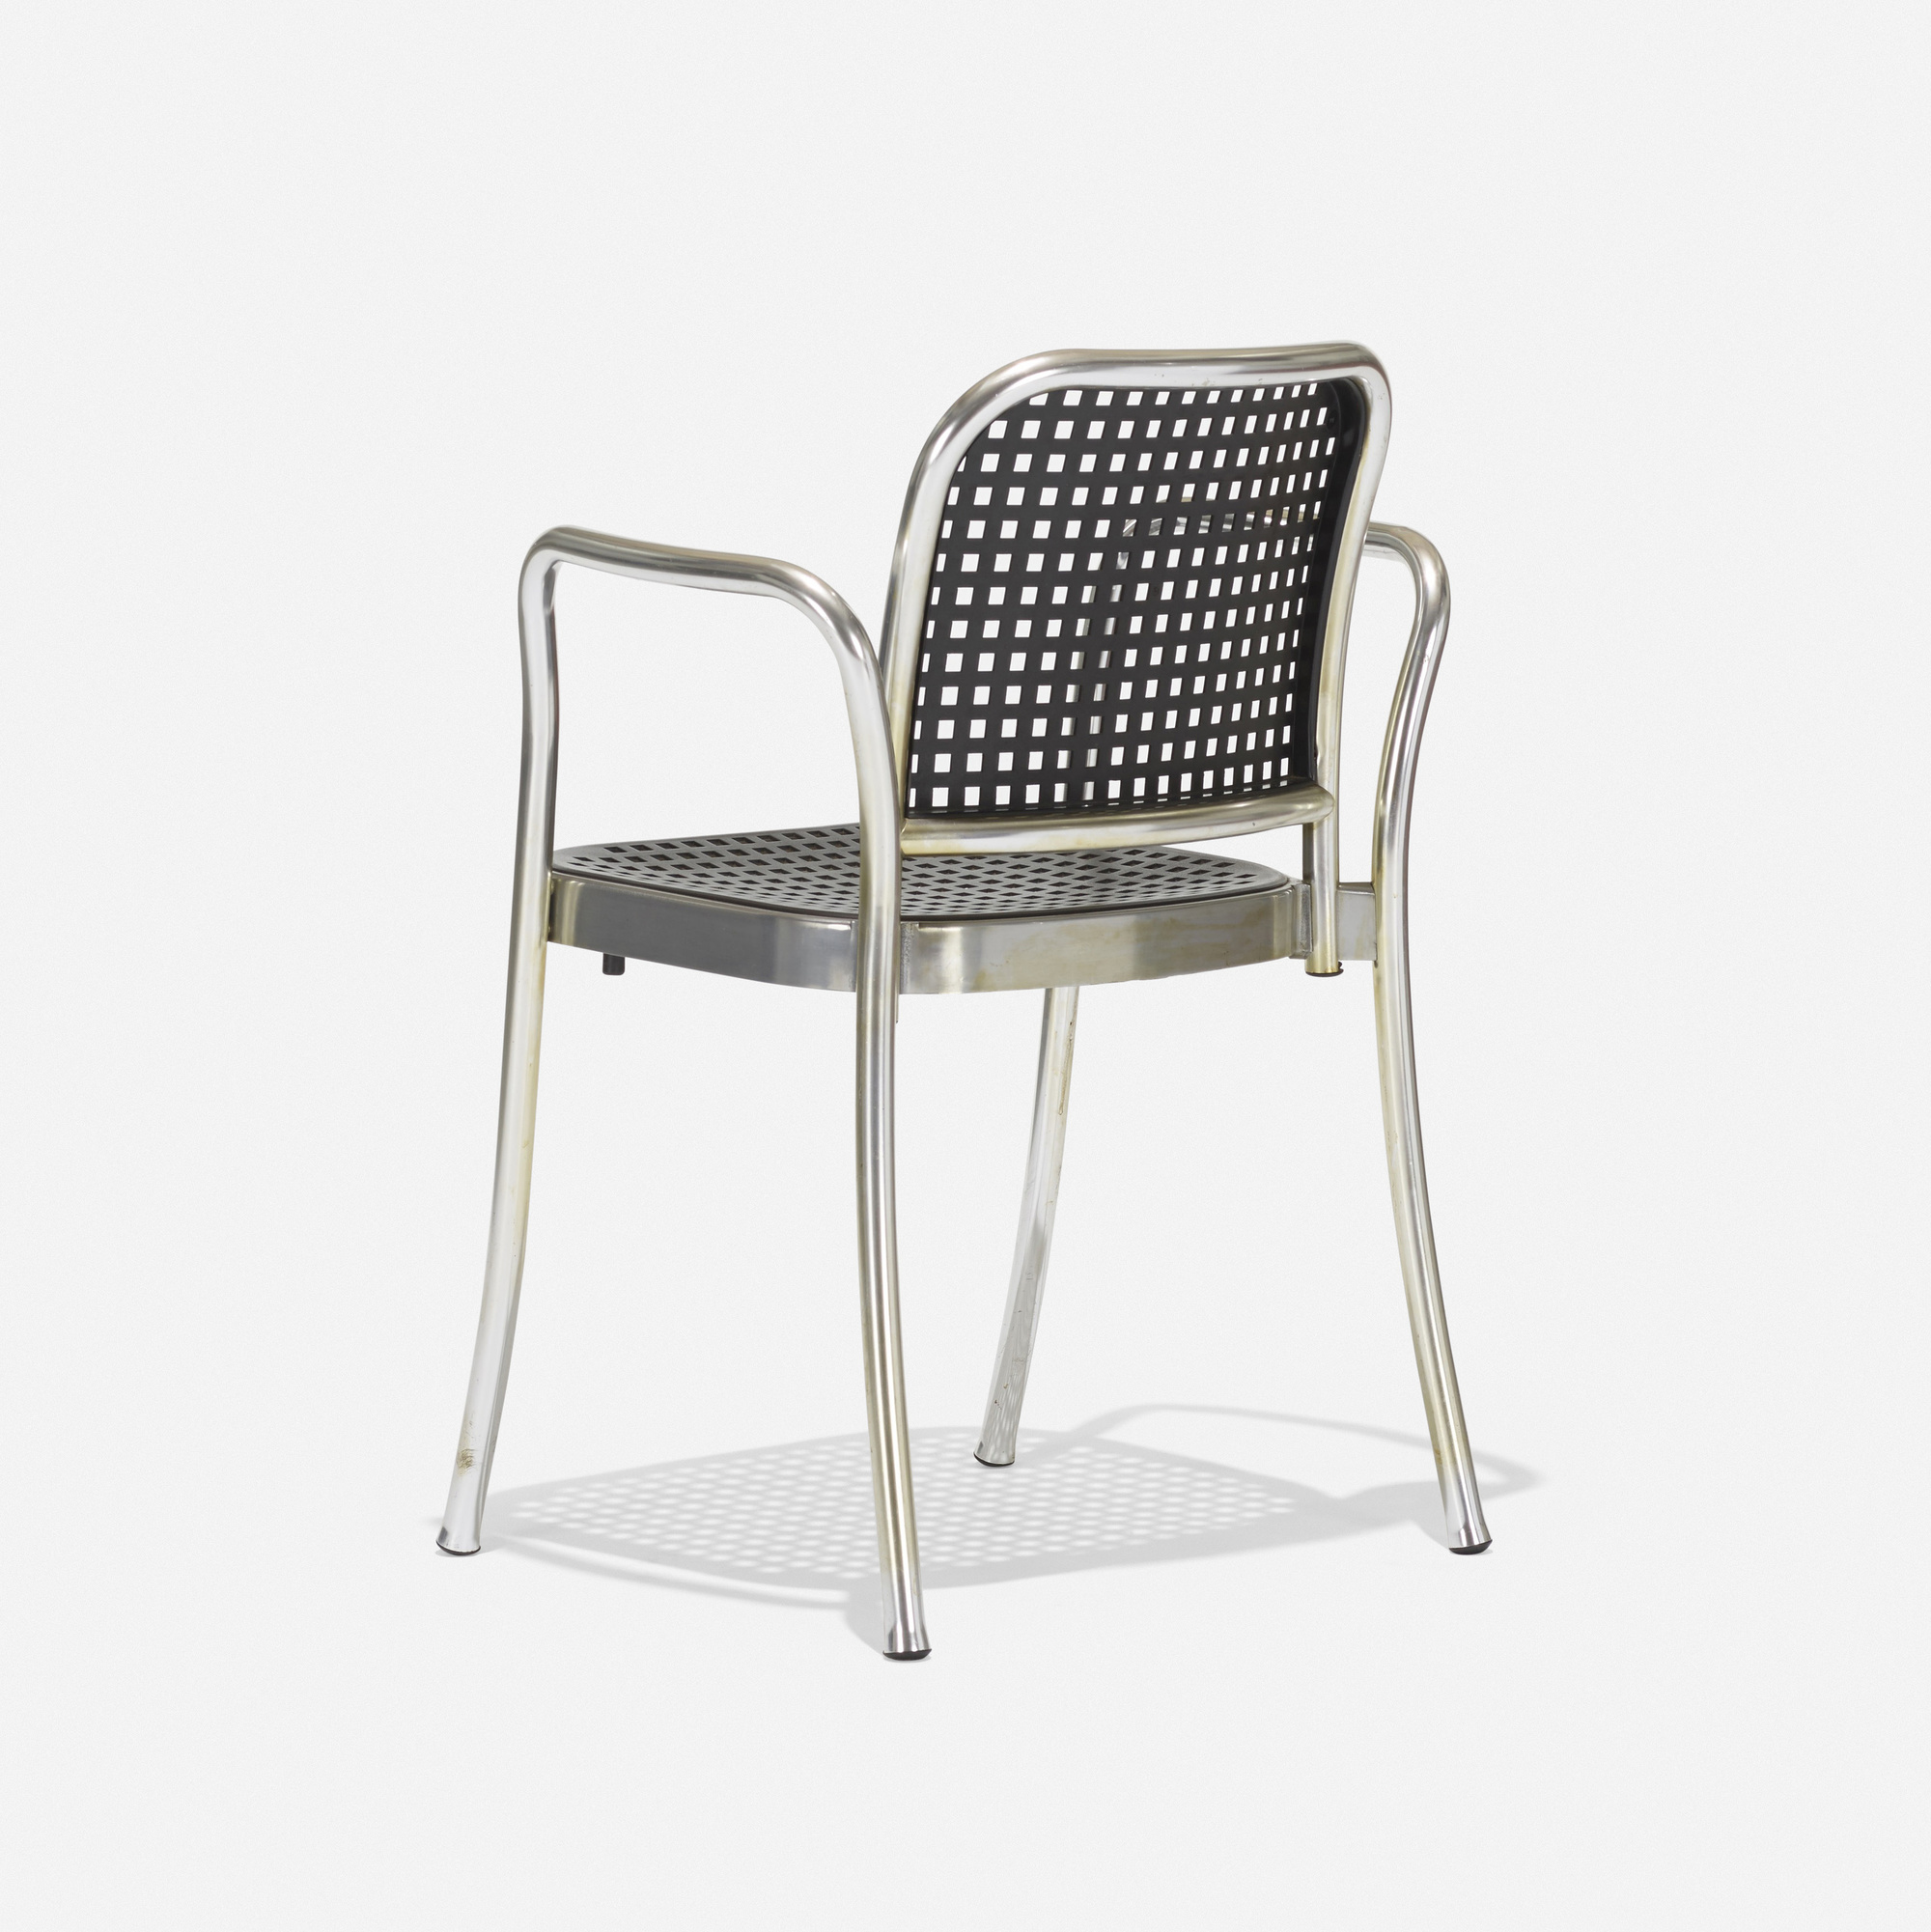 Silver chair furniture -  338 Vico Magistretti Silver Chair 3 Of 3